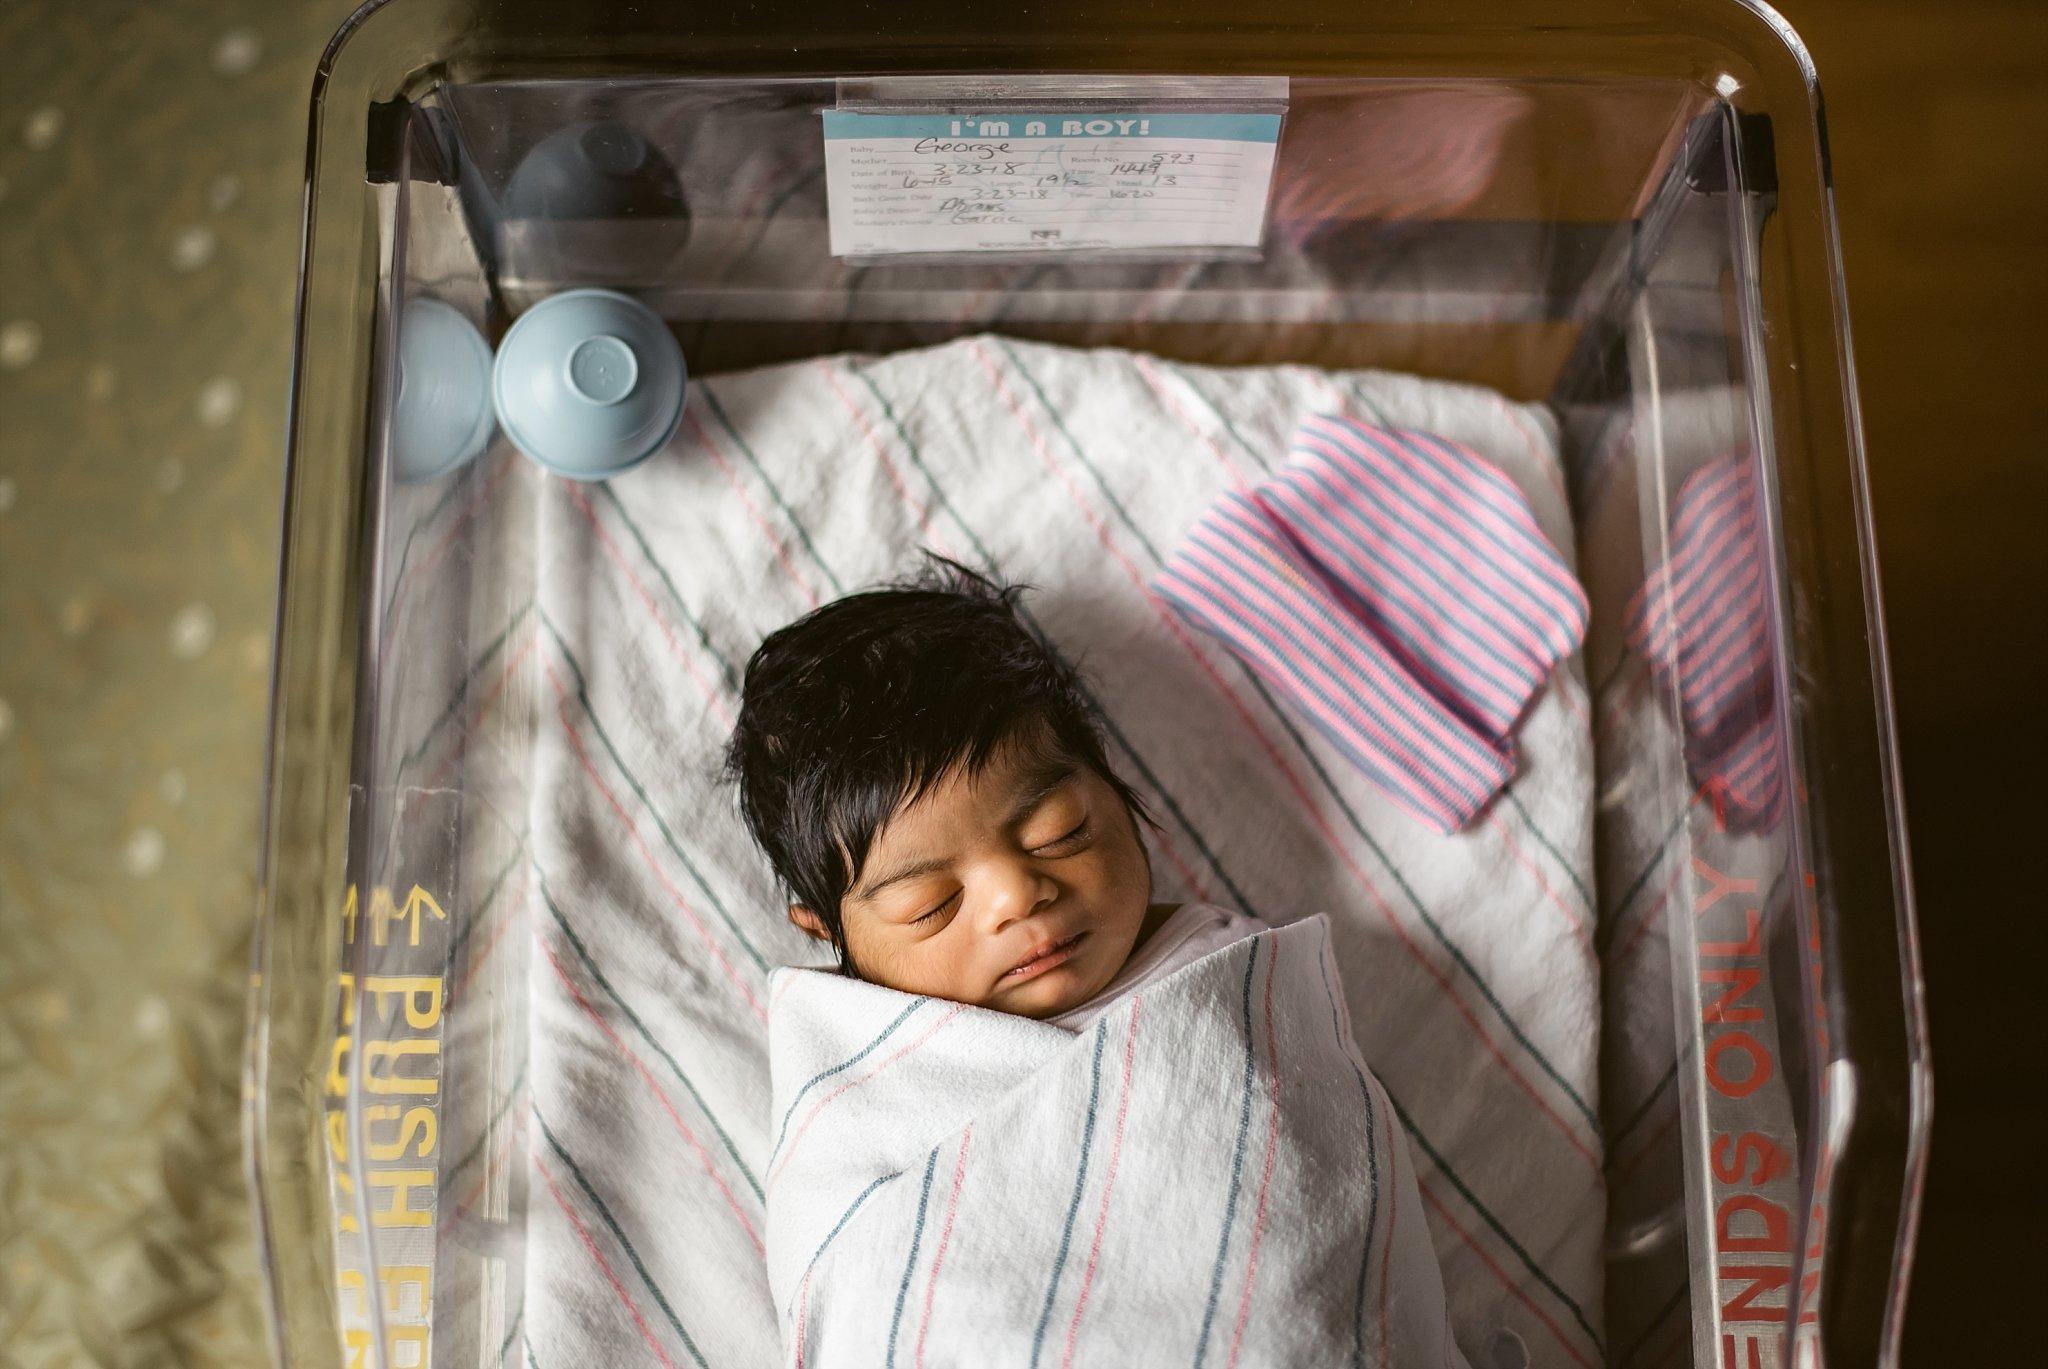 Newborn Baby Boy in hospital bassinet at Northside Atlanta Hospital